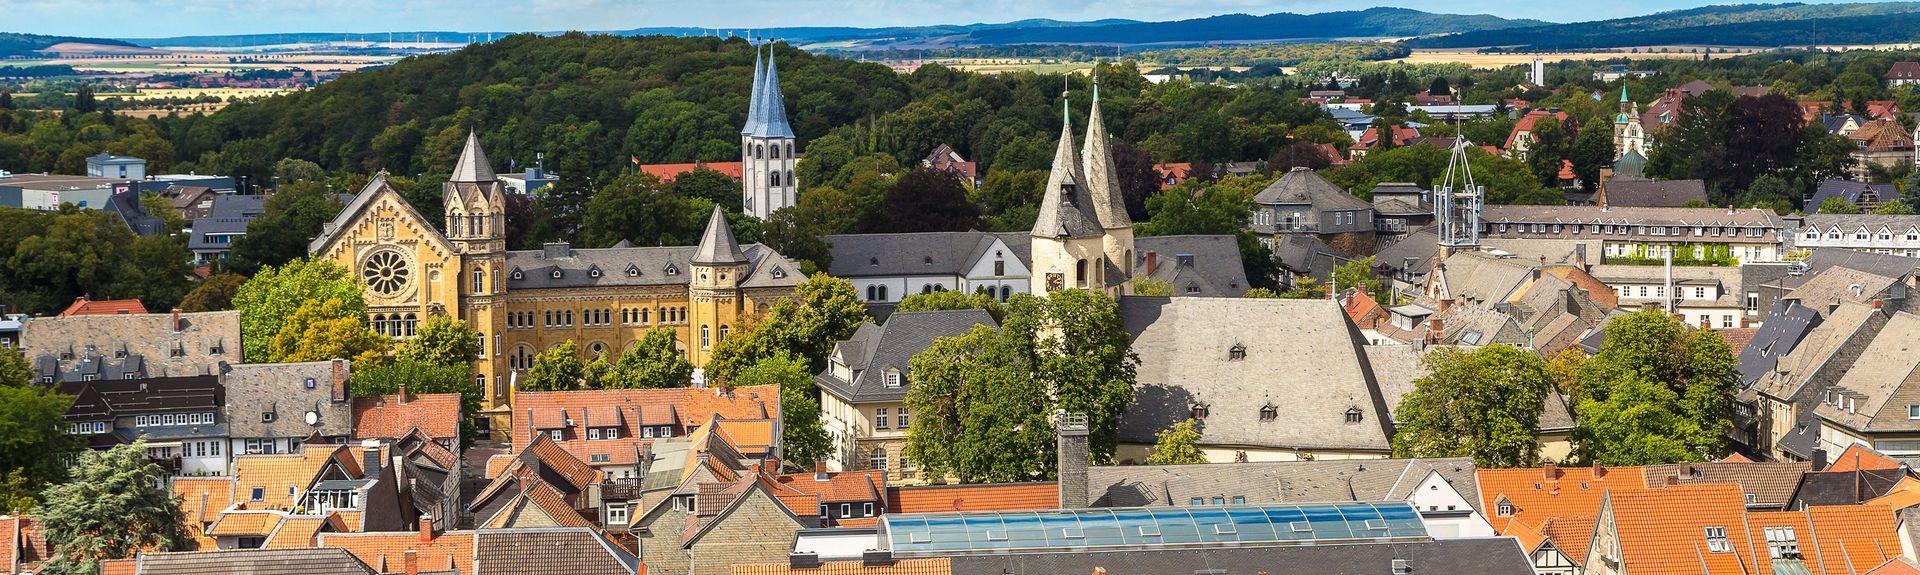 Goslar Rural District, Germany